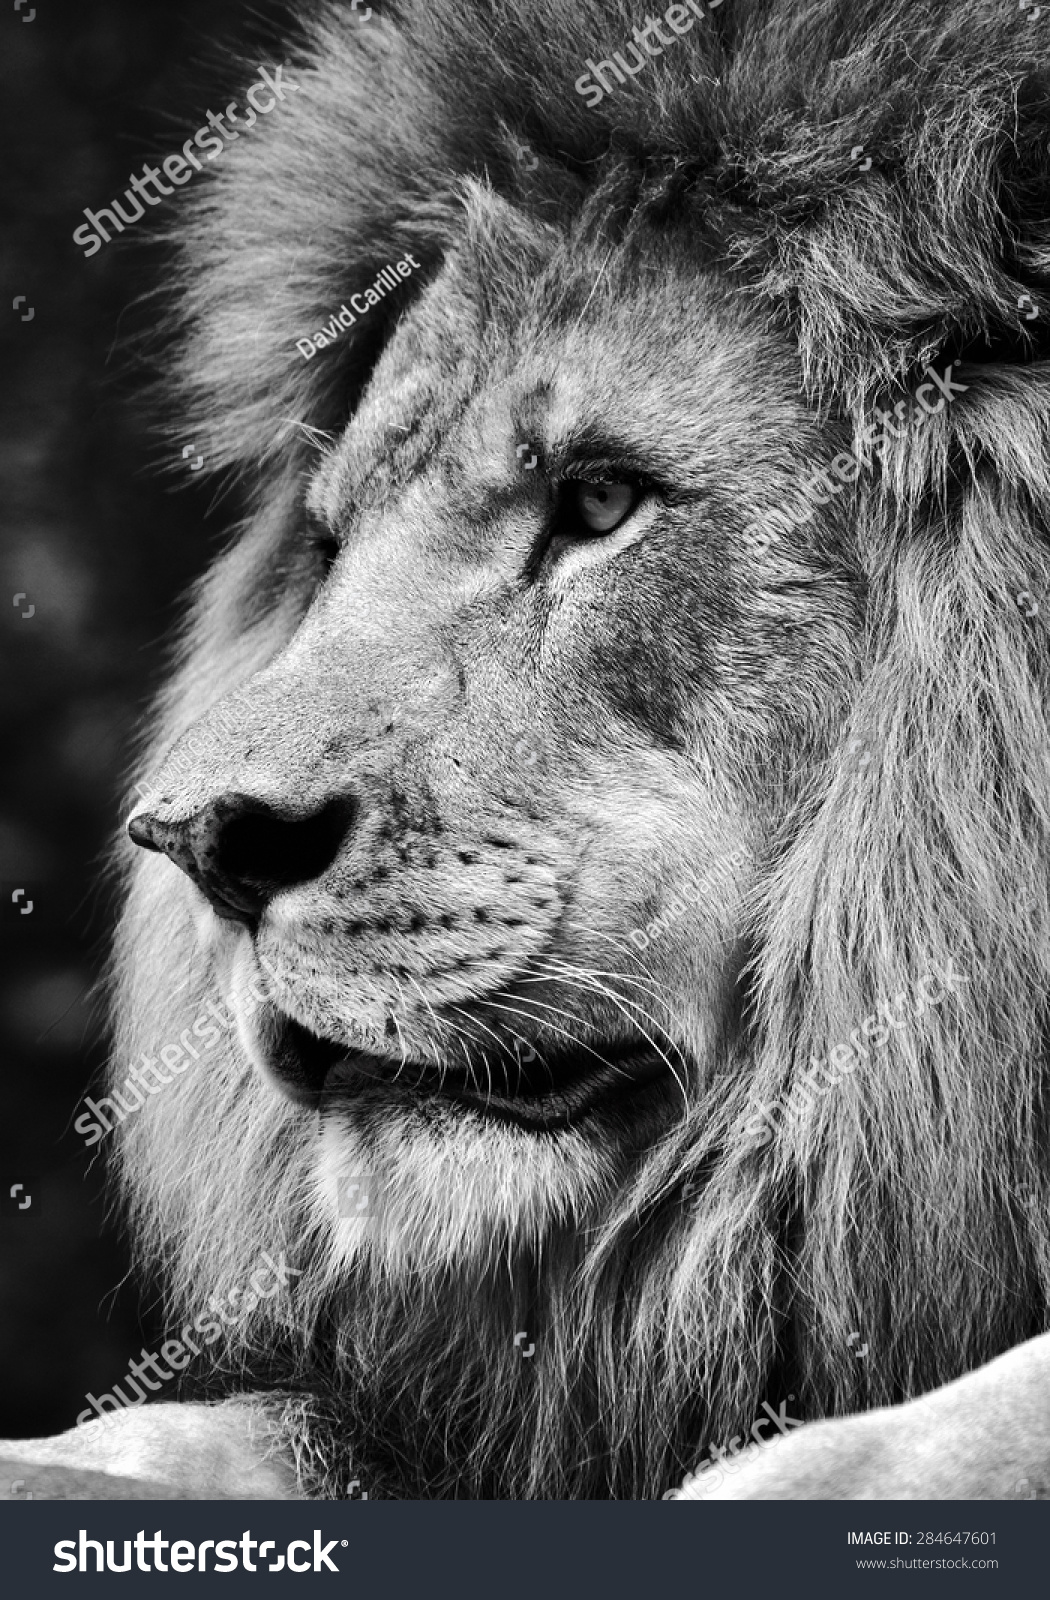 White lion face images - photo#22